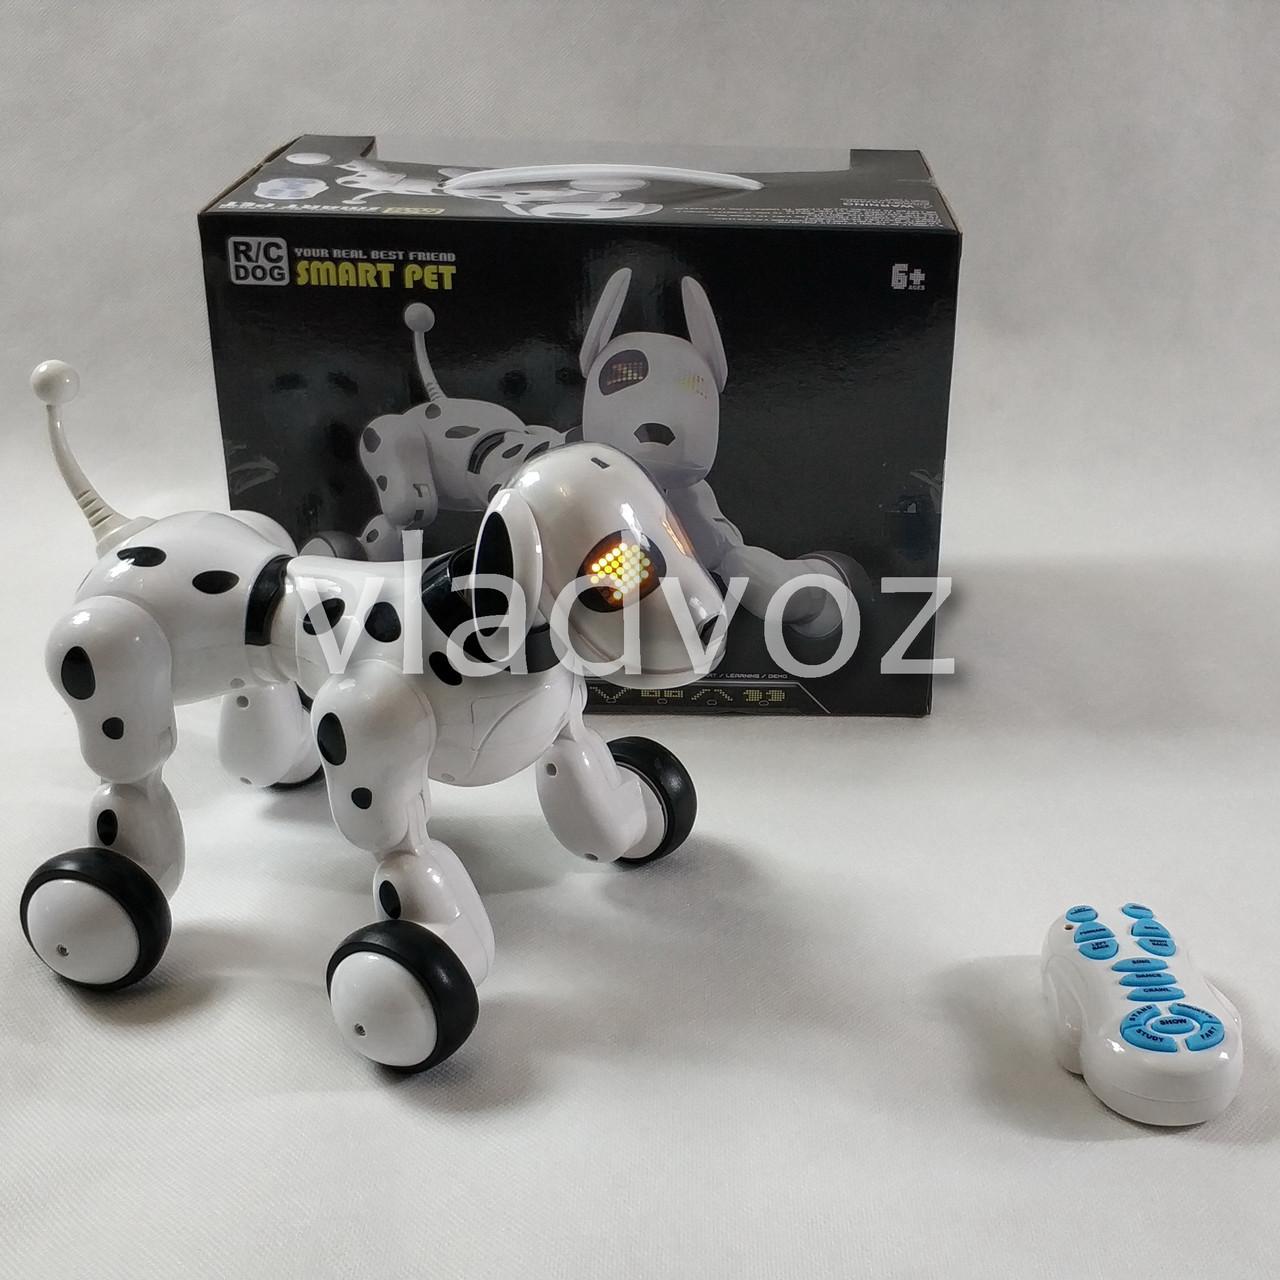 фото коробки интерактивной игрушки собака щенок робот Smart pet